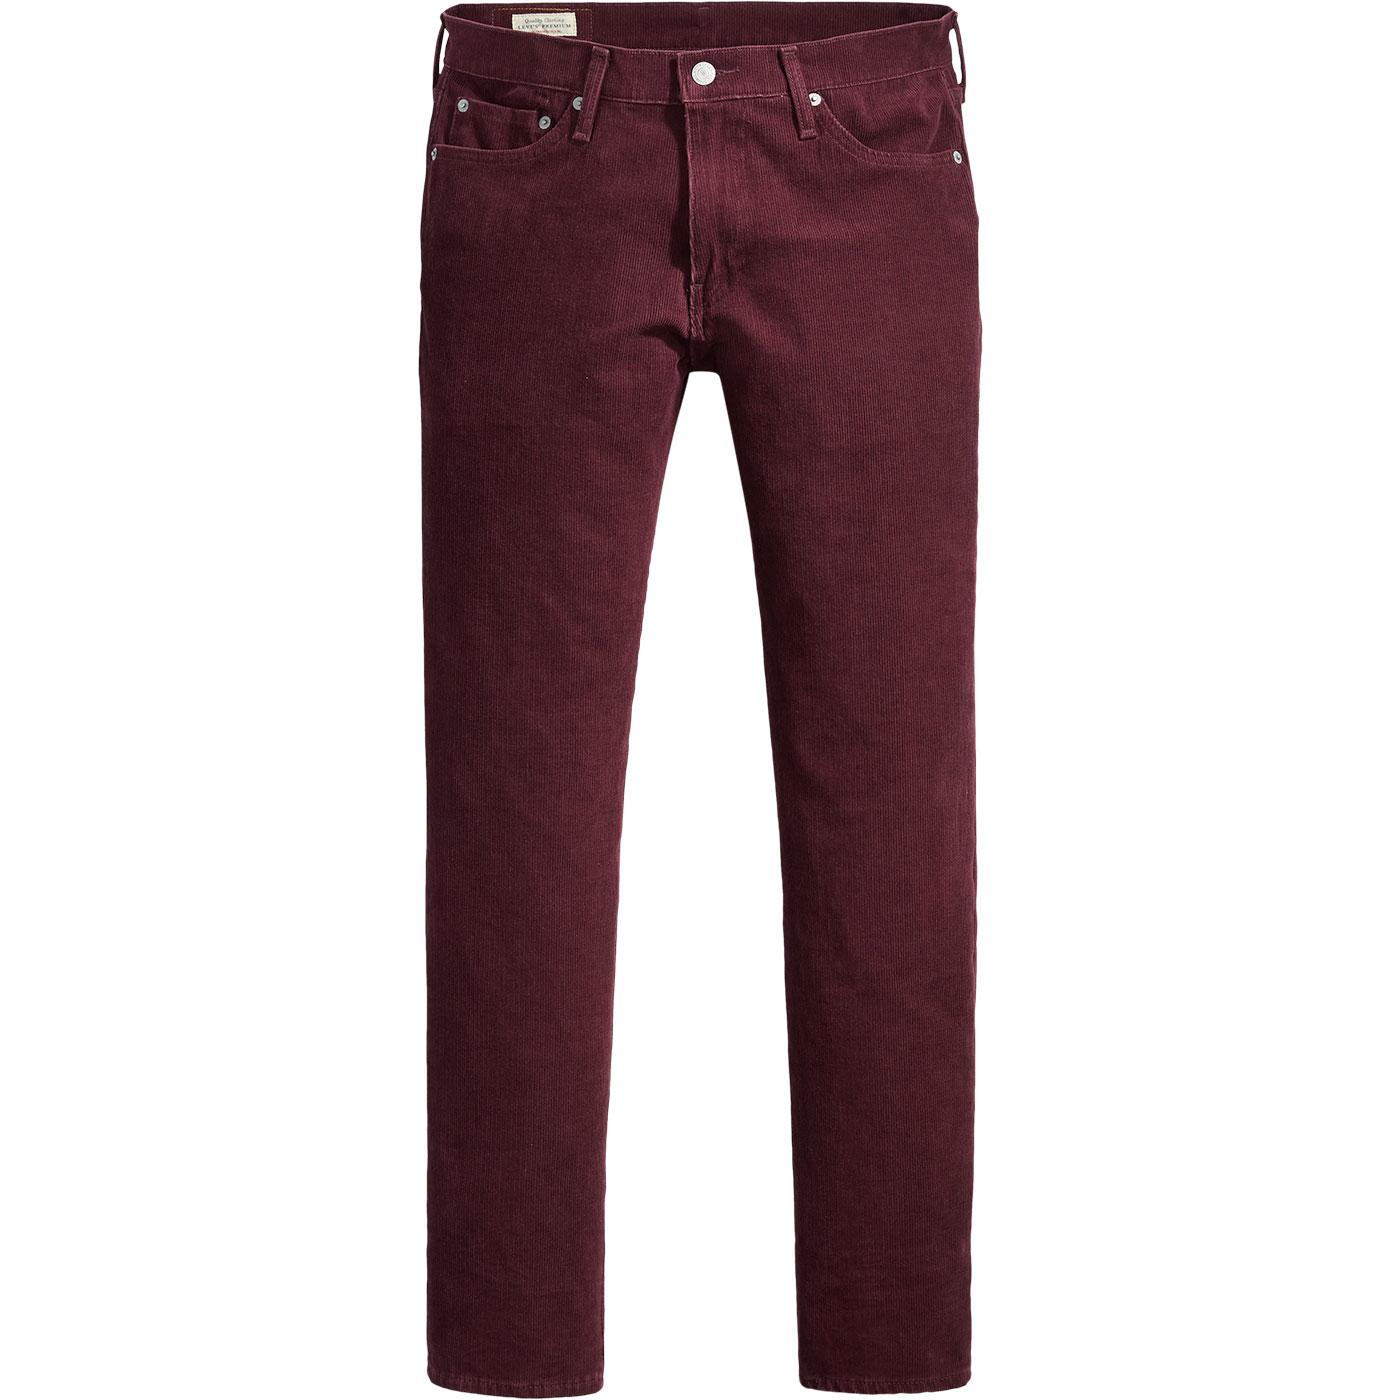 LEVI'S 511 Retro Mod Slim Cord Jeans (Winetasting)